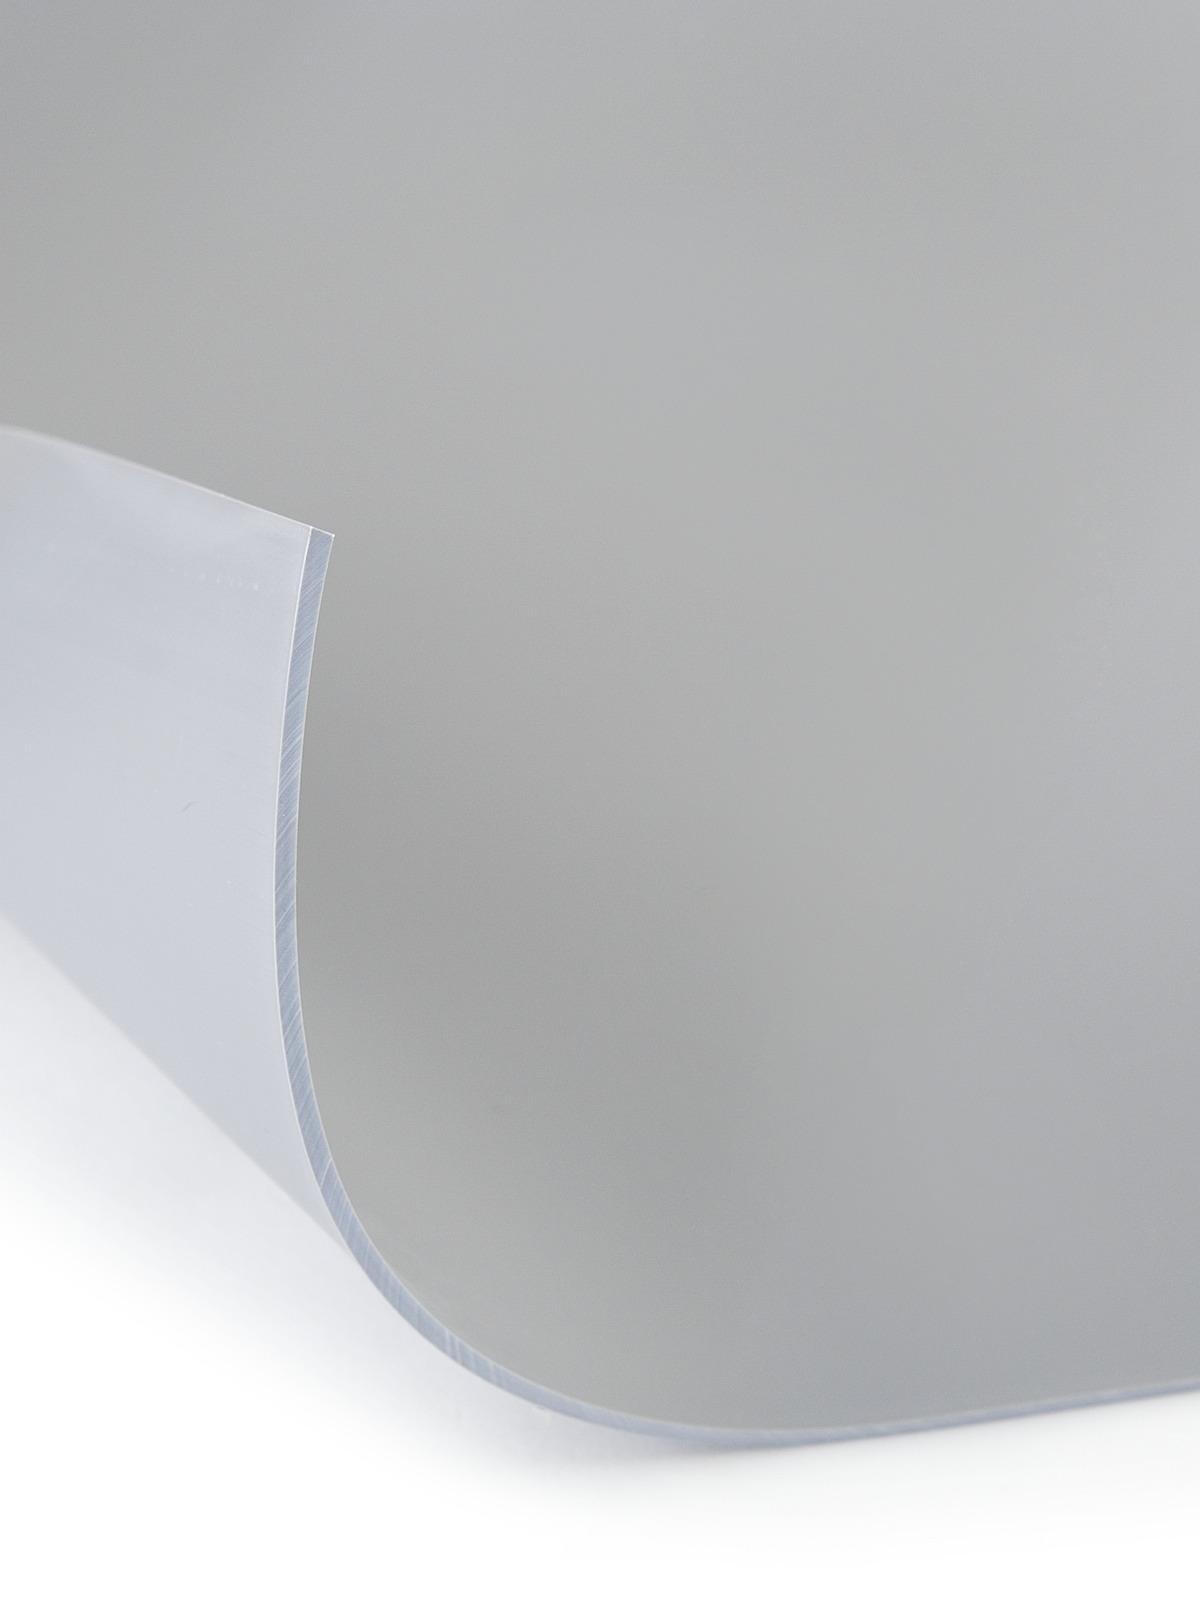 Jack Richeson - Unmounted Easy-to-Cut Linoleum